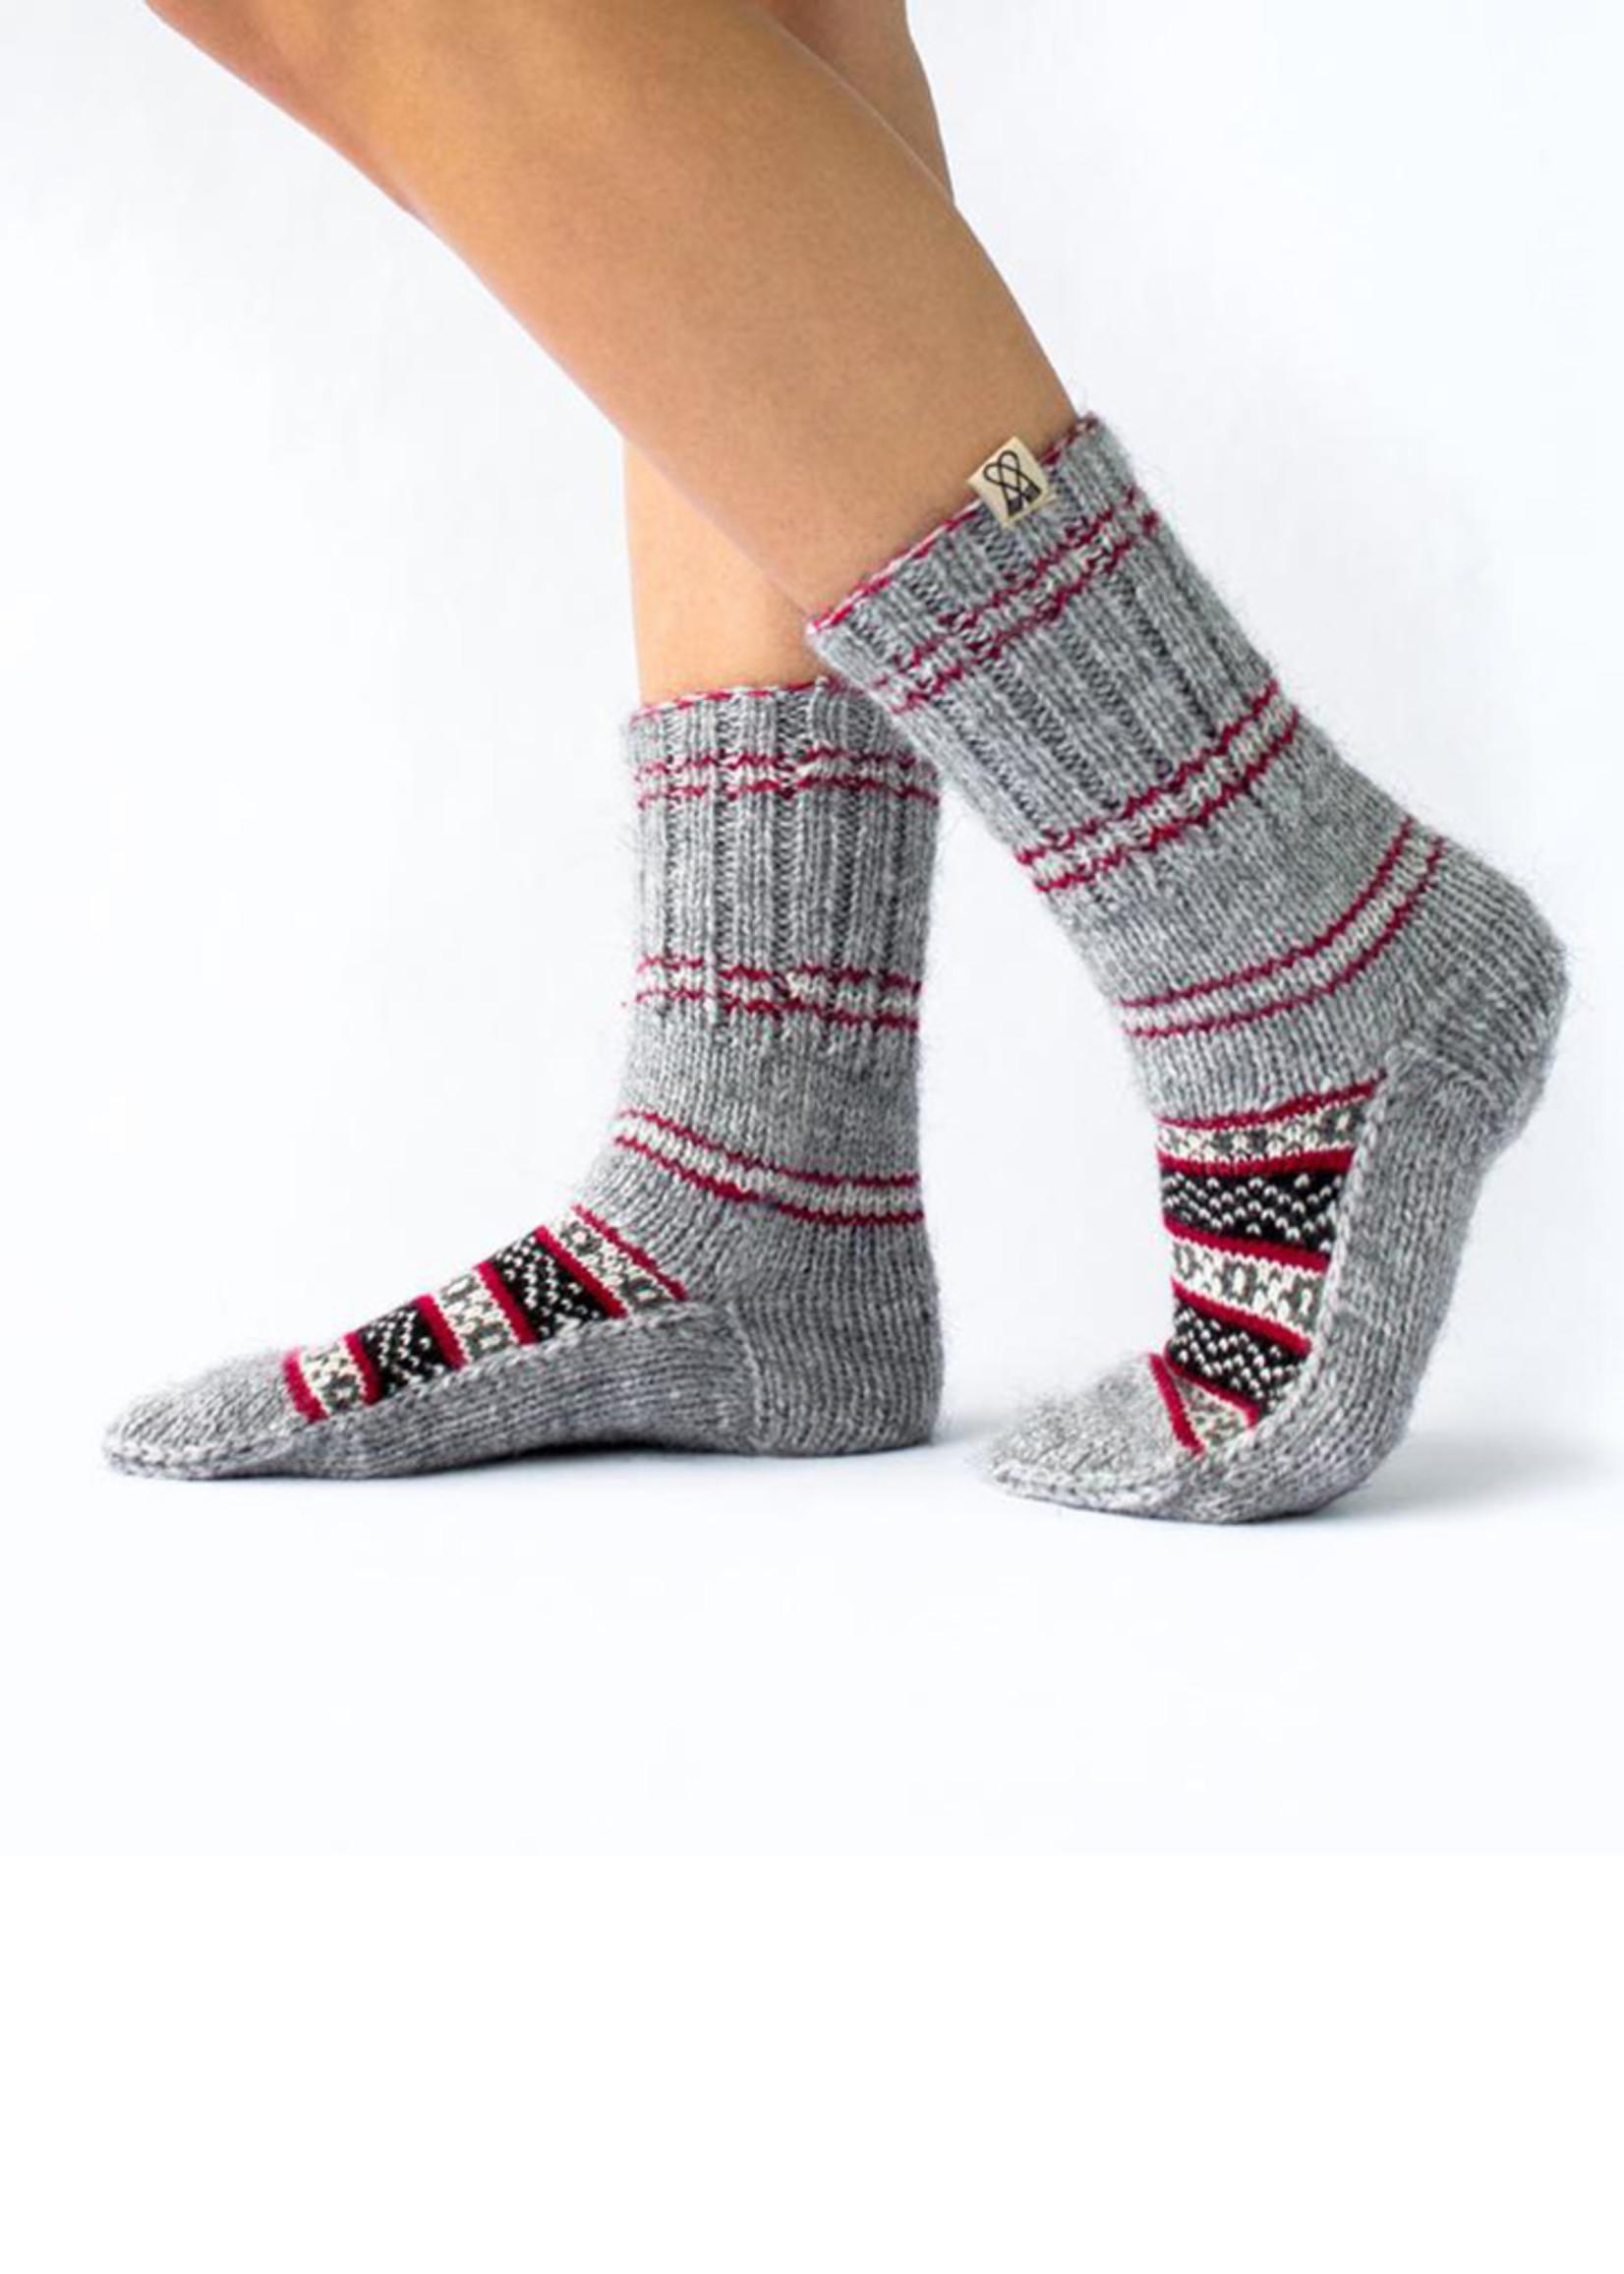 Uttar (North) Grey & Red Socks